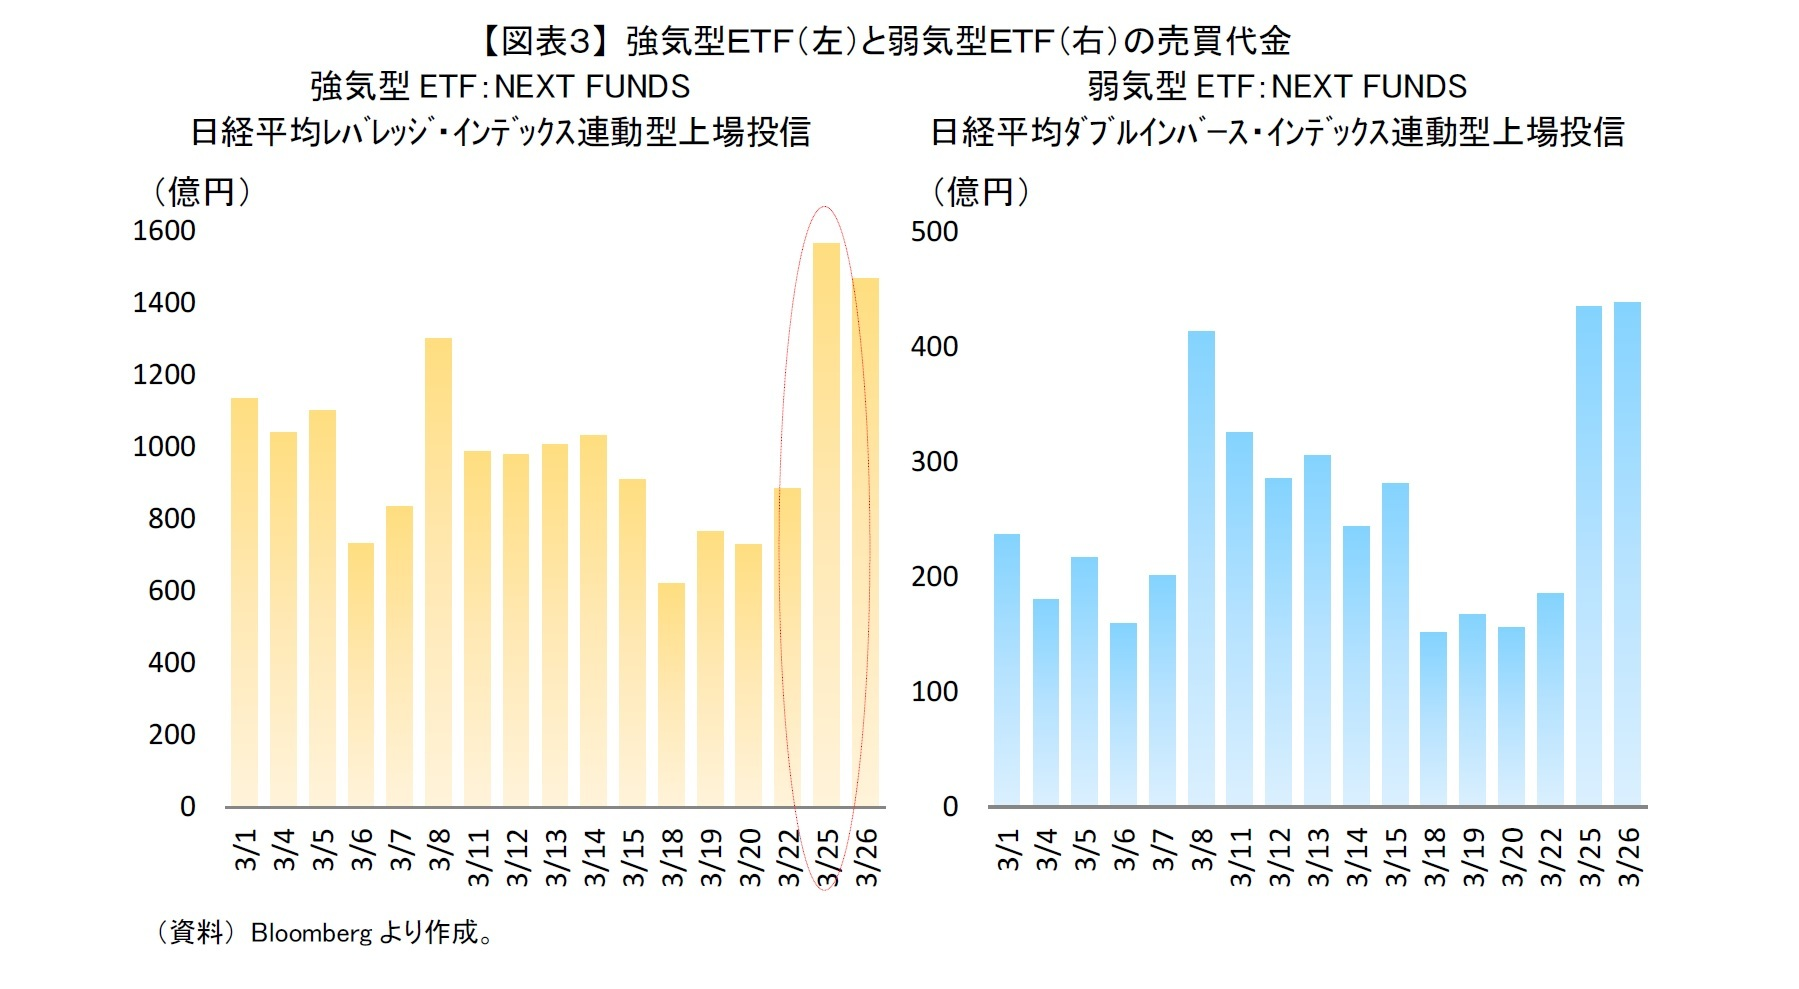 【図表3】 強気型ETF(左)と弱気型ETF(右)の売買代金